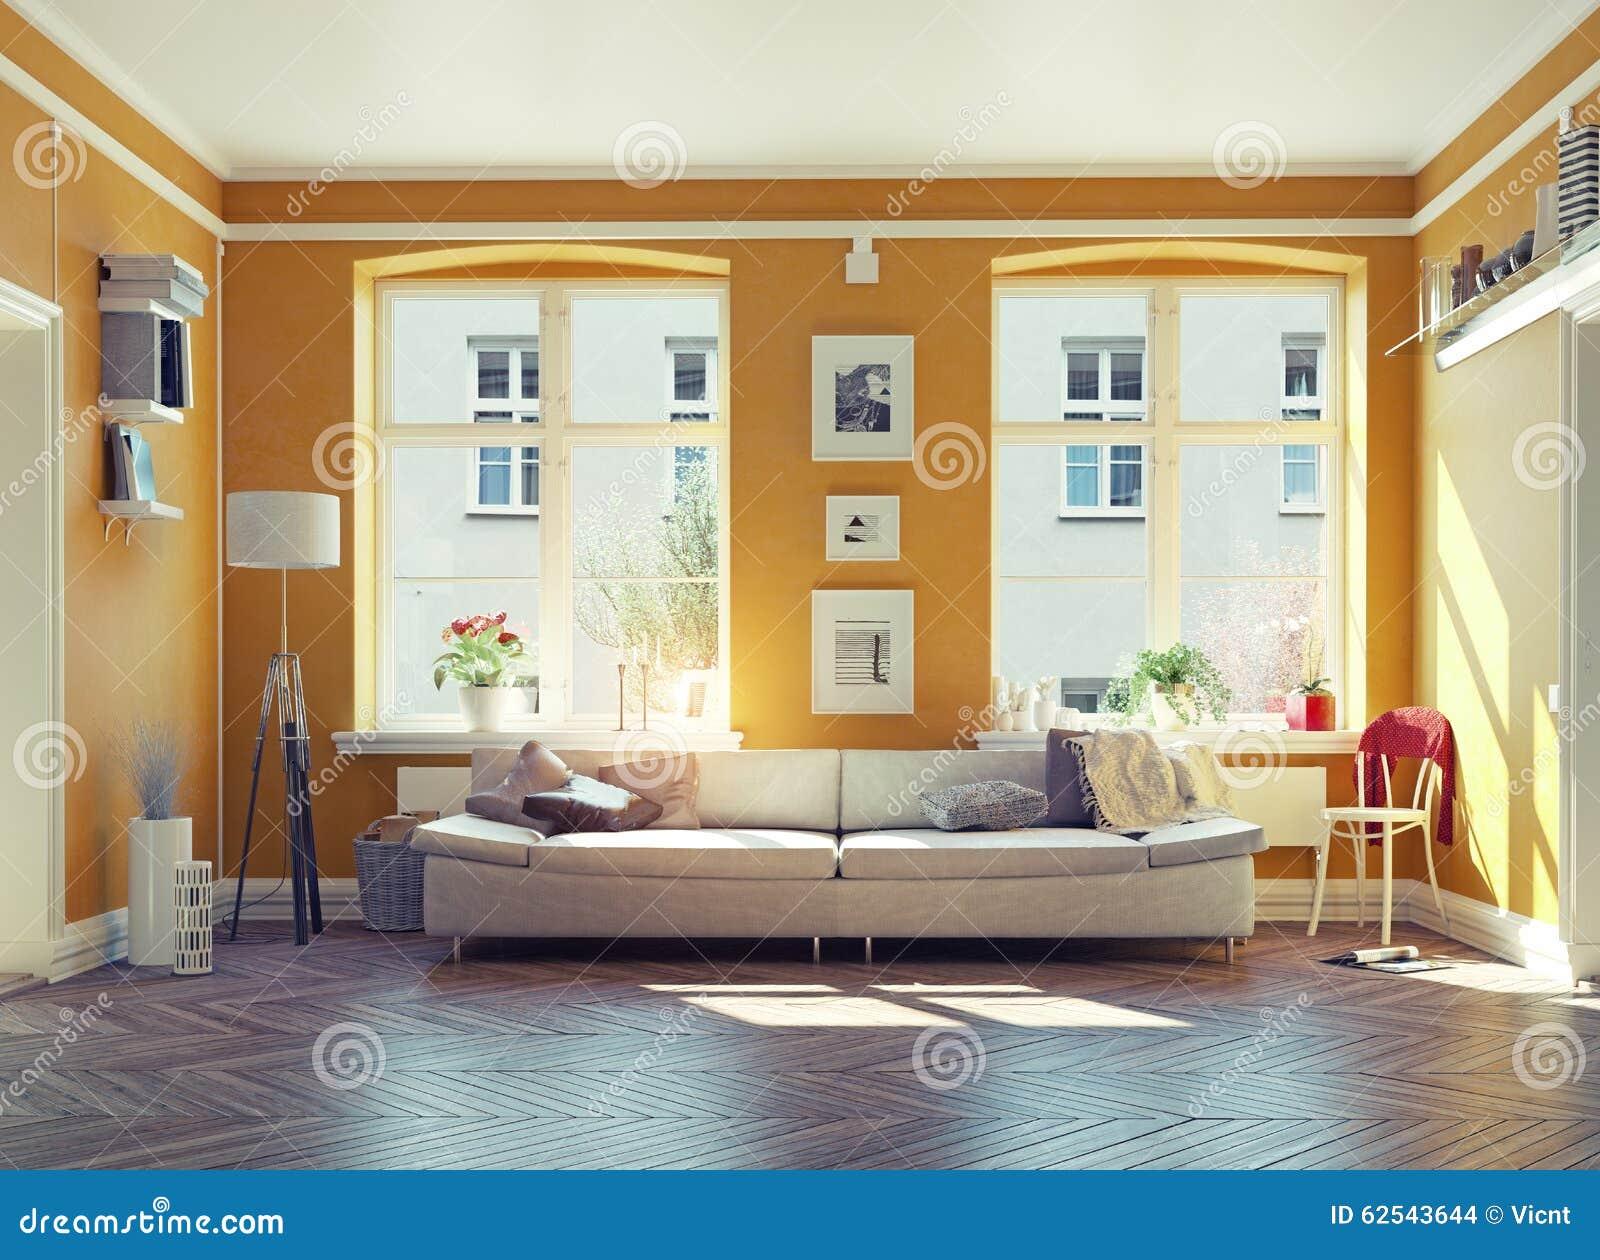 Living Room Stock Illustration Image 62543644